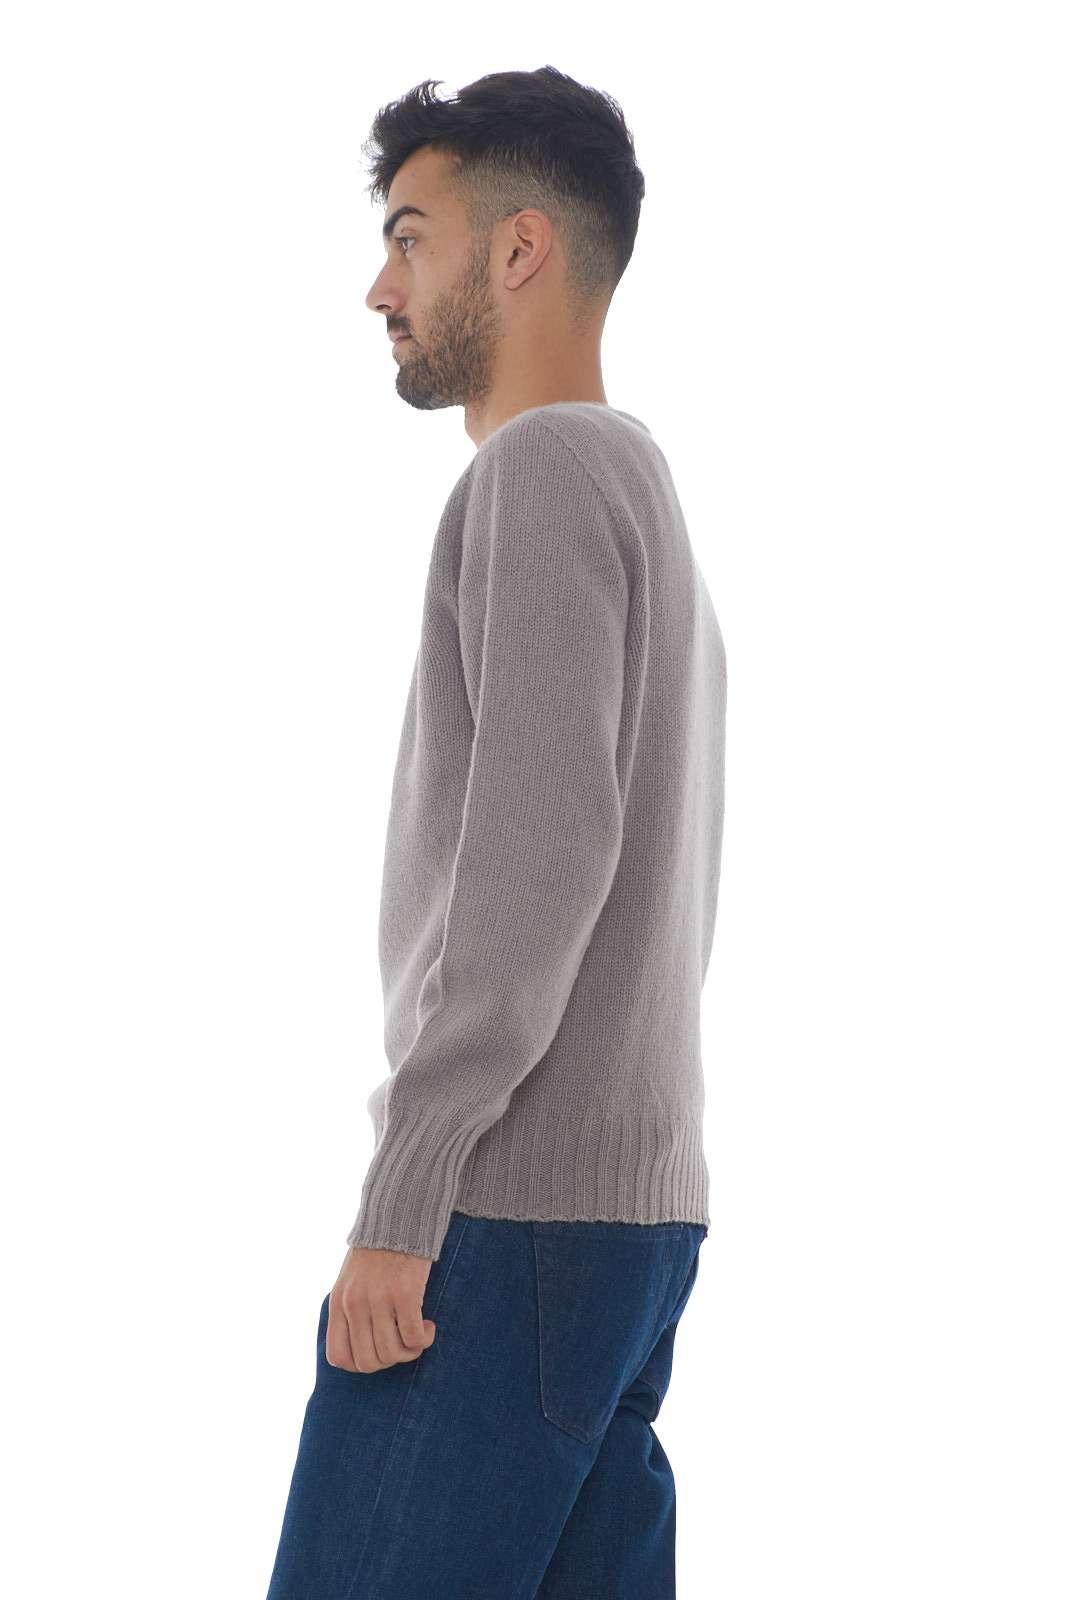 https://www.parmax.com/media/catalog/product/a/i/AI-outlet_parmax-maglia-uomo-Acquapura-001-B.jpg